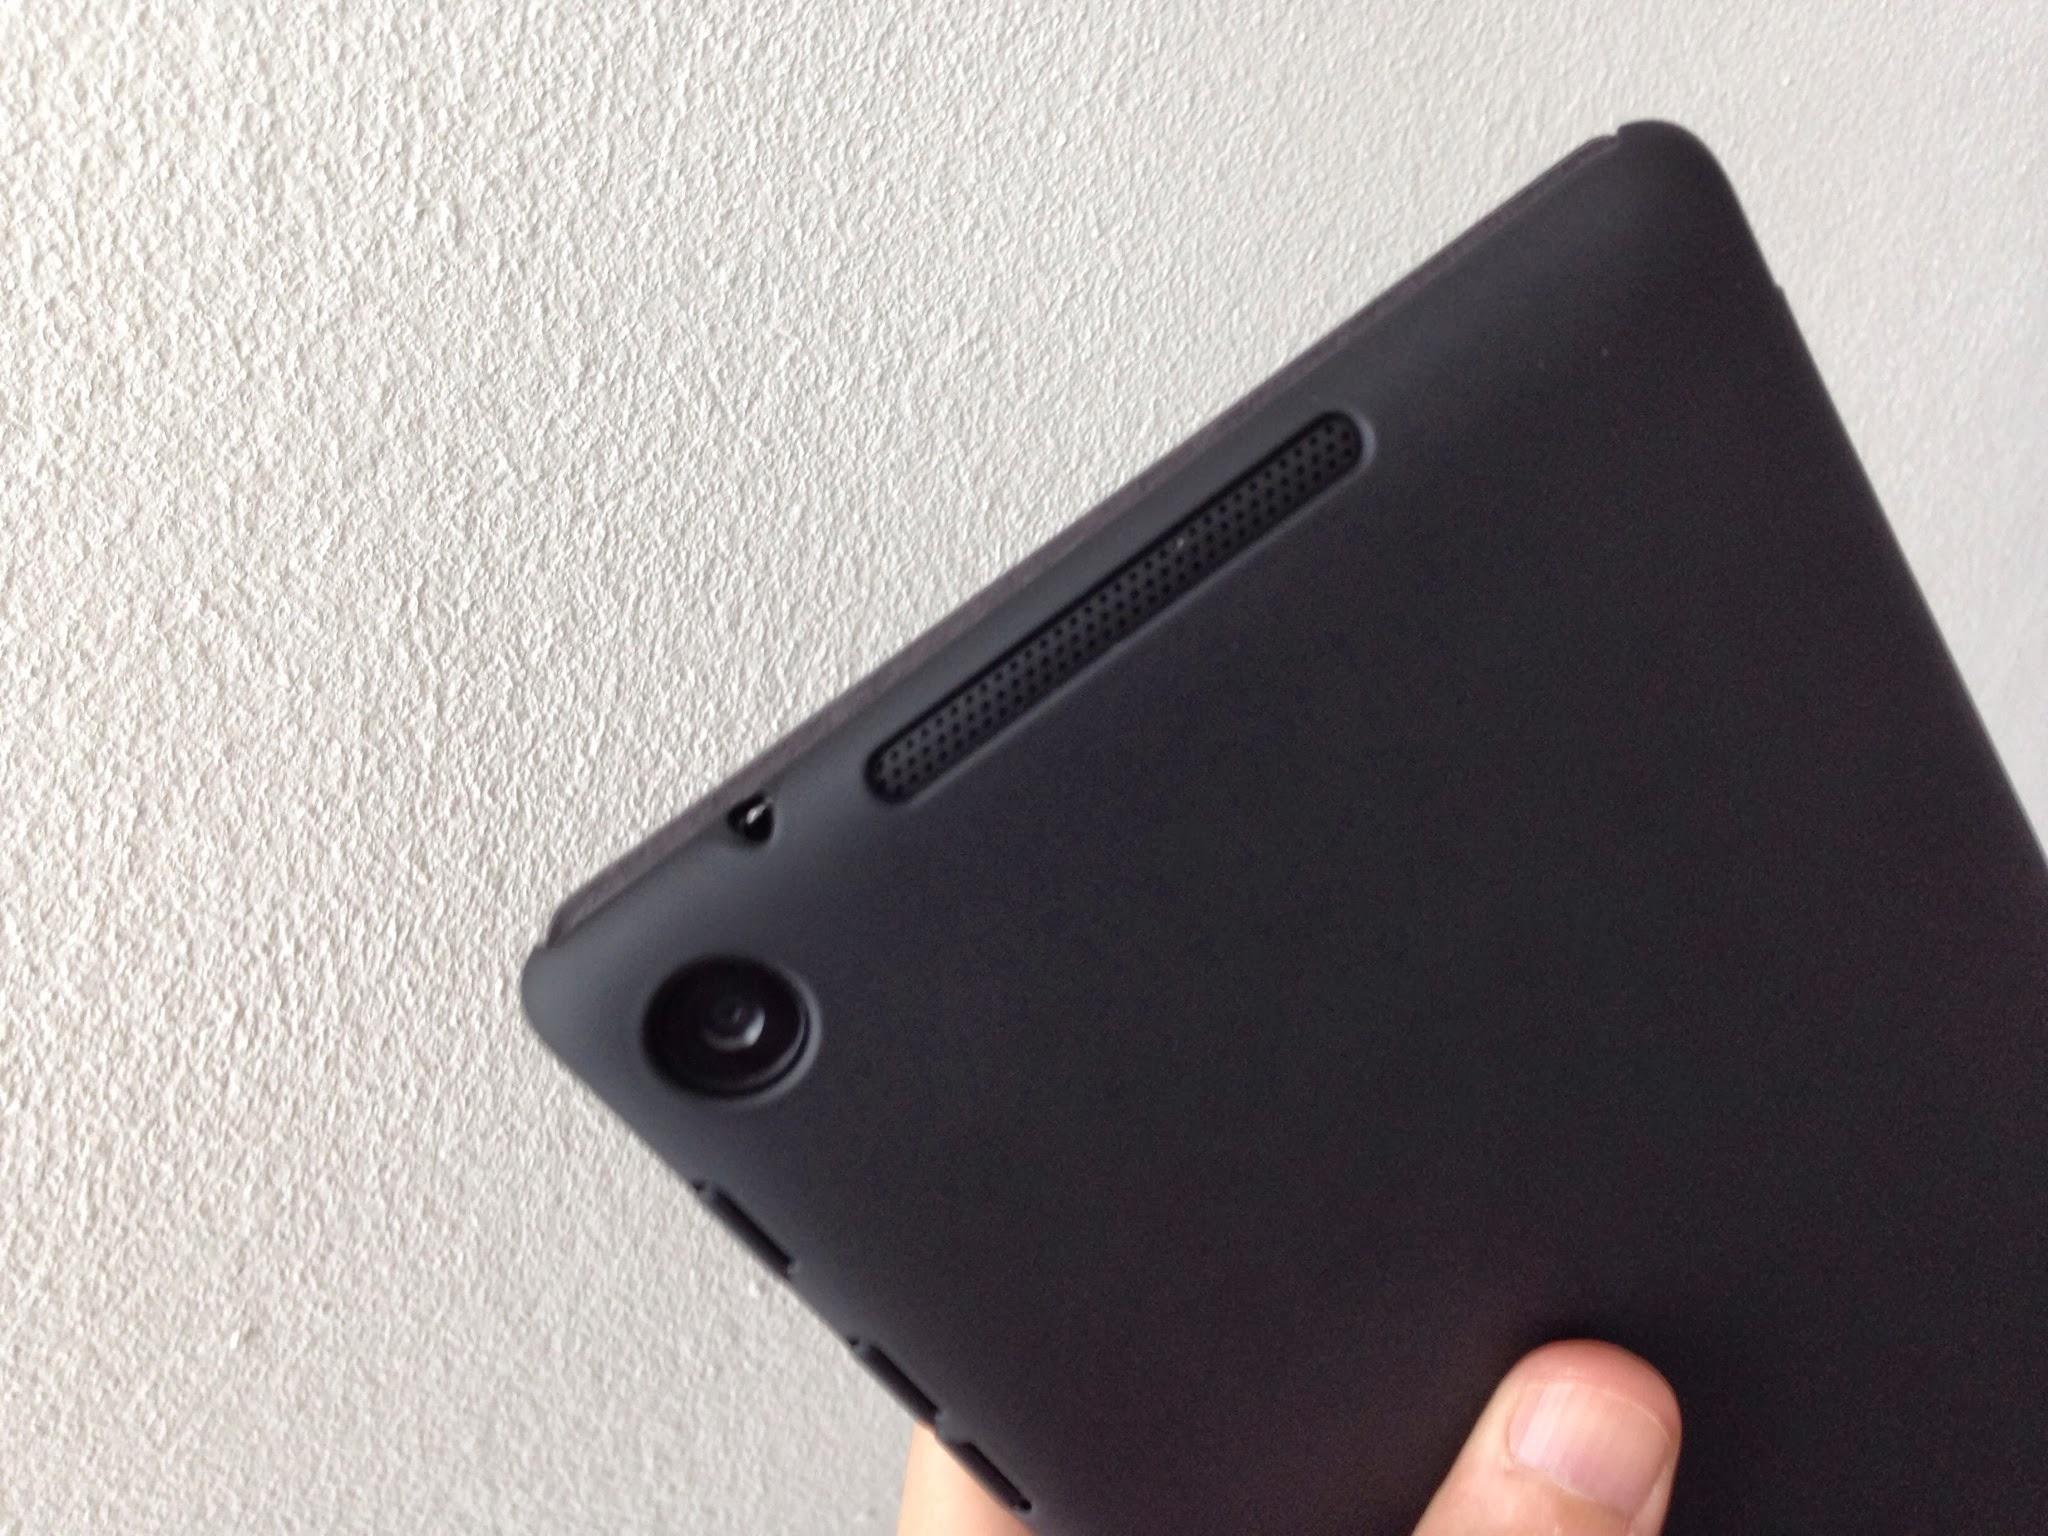 release date 7b321 8bc5e Review: Asus Premium Cover for Nexus 7 (2013)   SmartPhoneBlogging